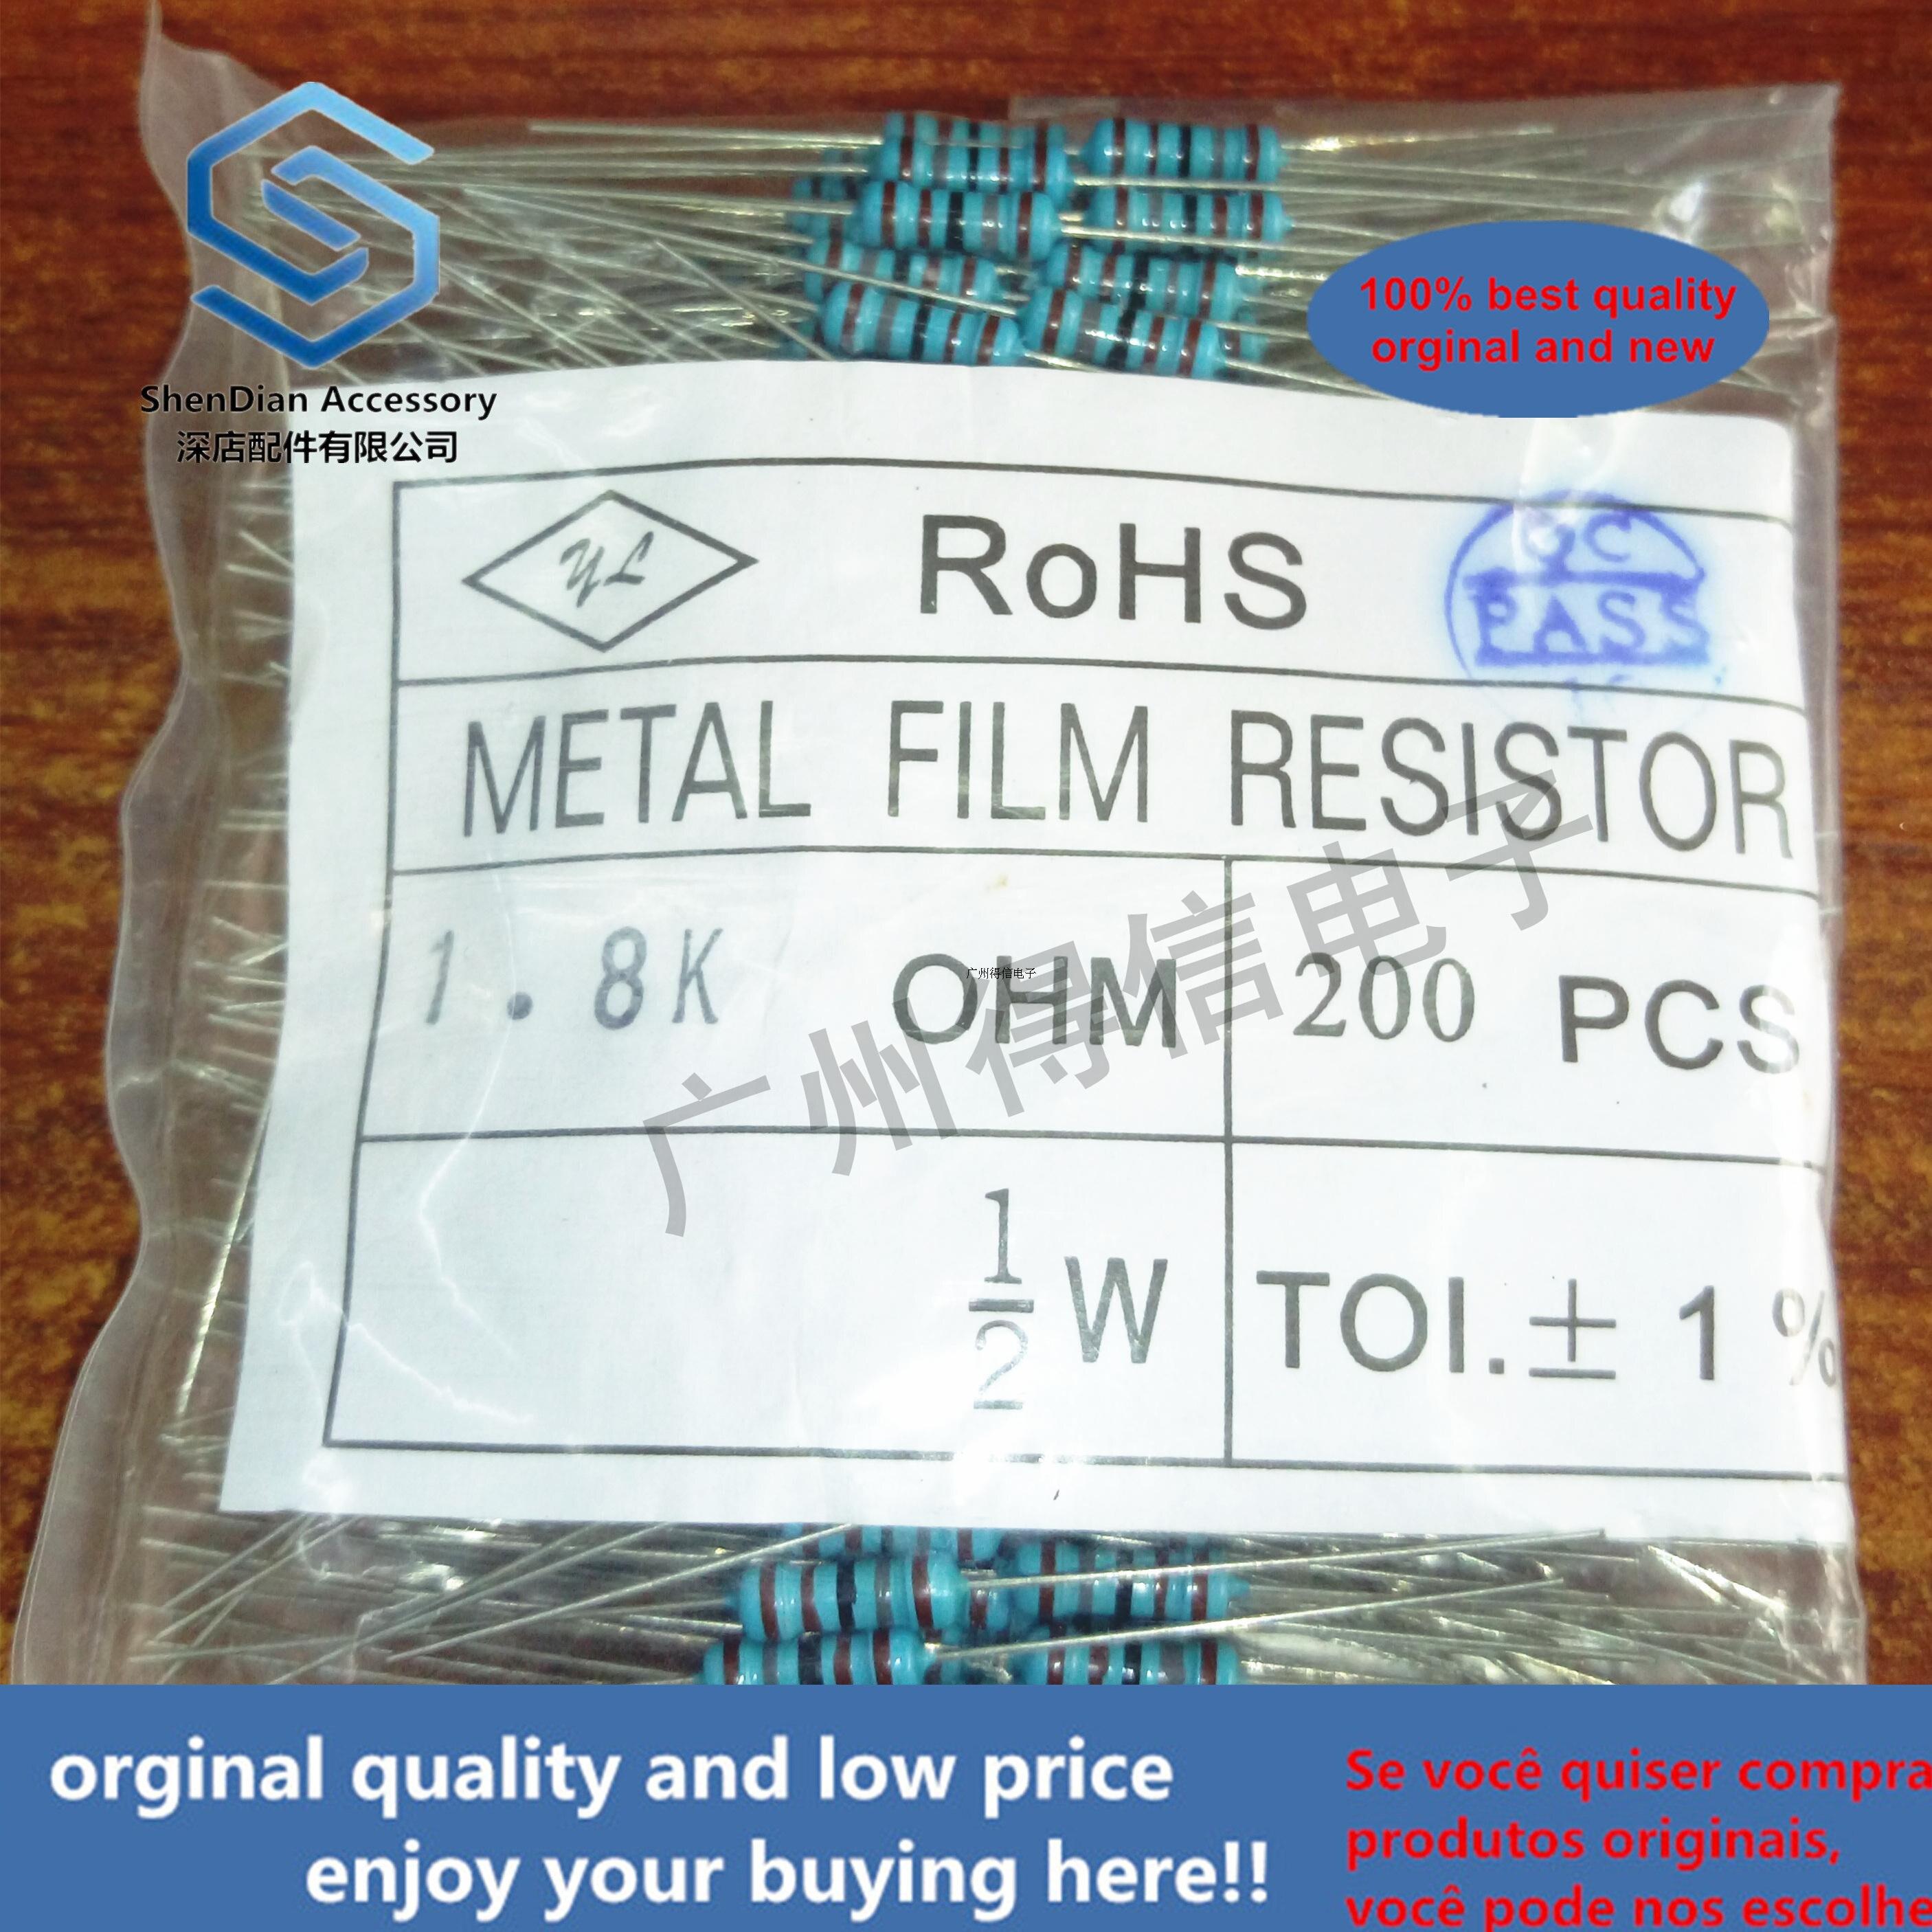 200pcs 1 / 2W 3.3R 3.3 Euro 1% Brand New Metal Film Iron Feet Resistor Bag 200 Pcs Per Pack